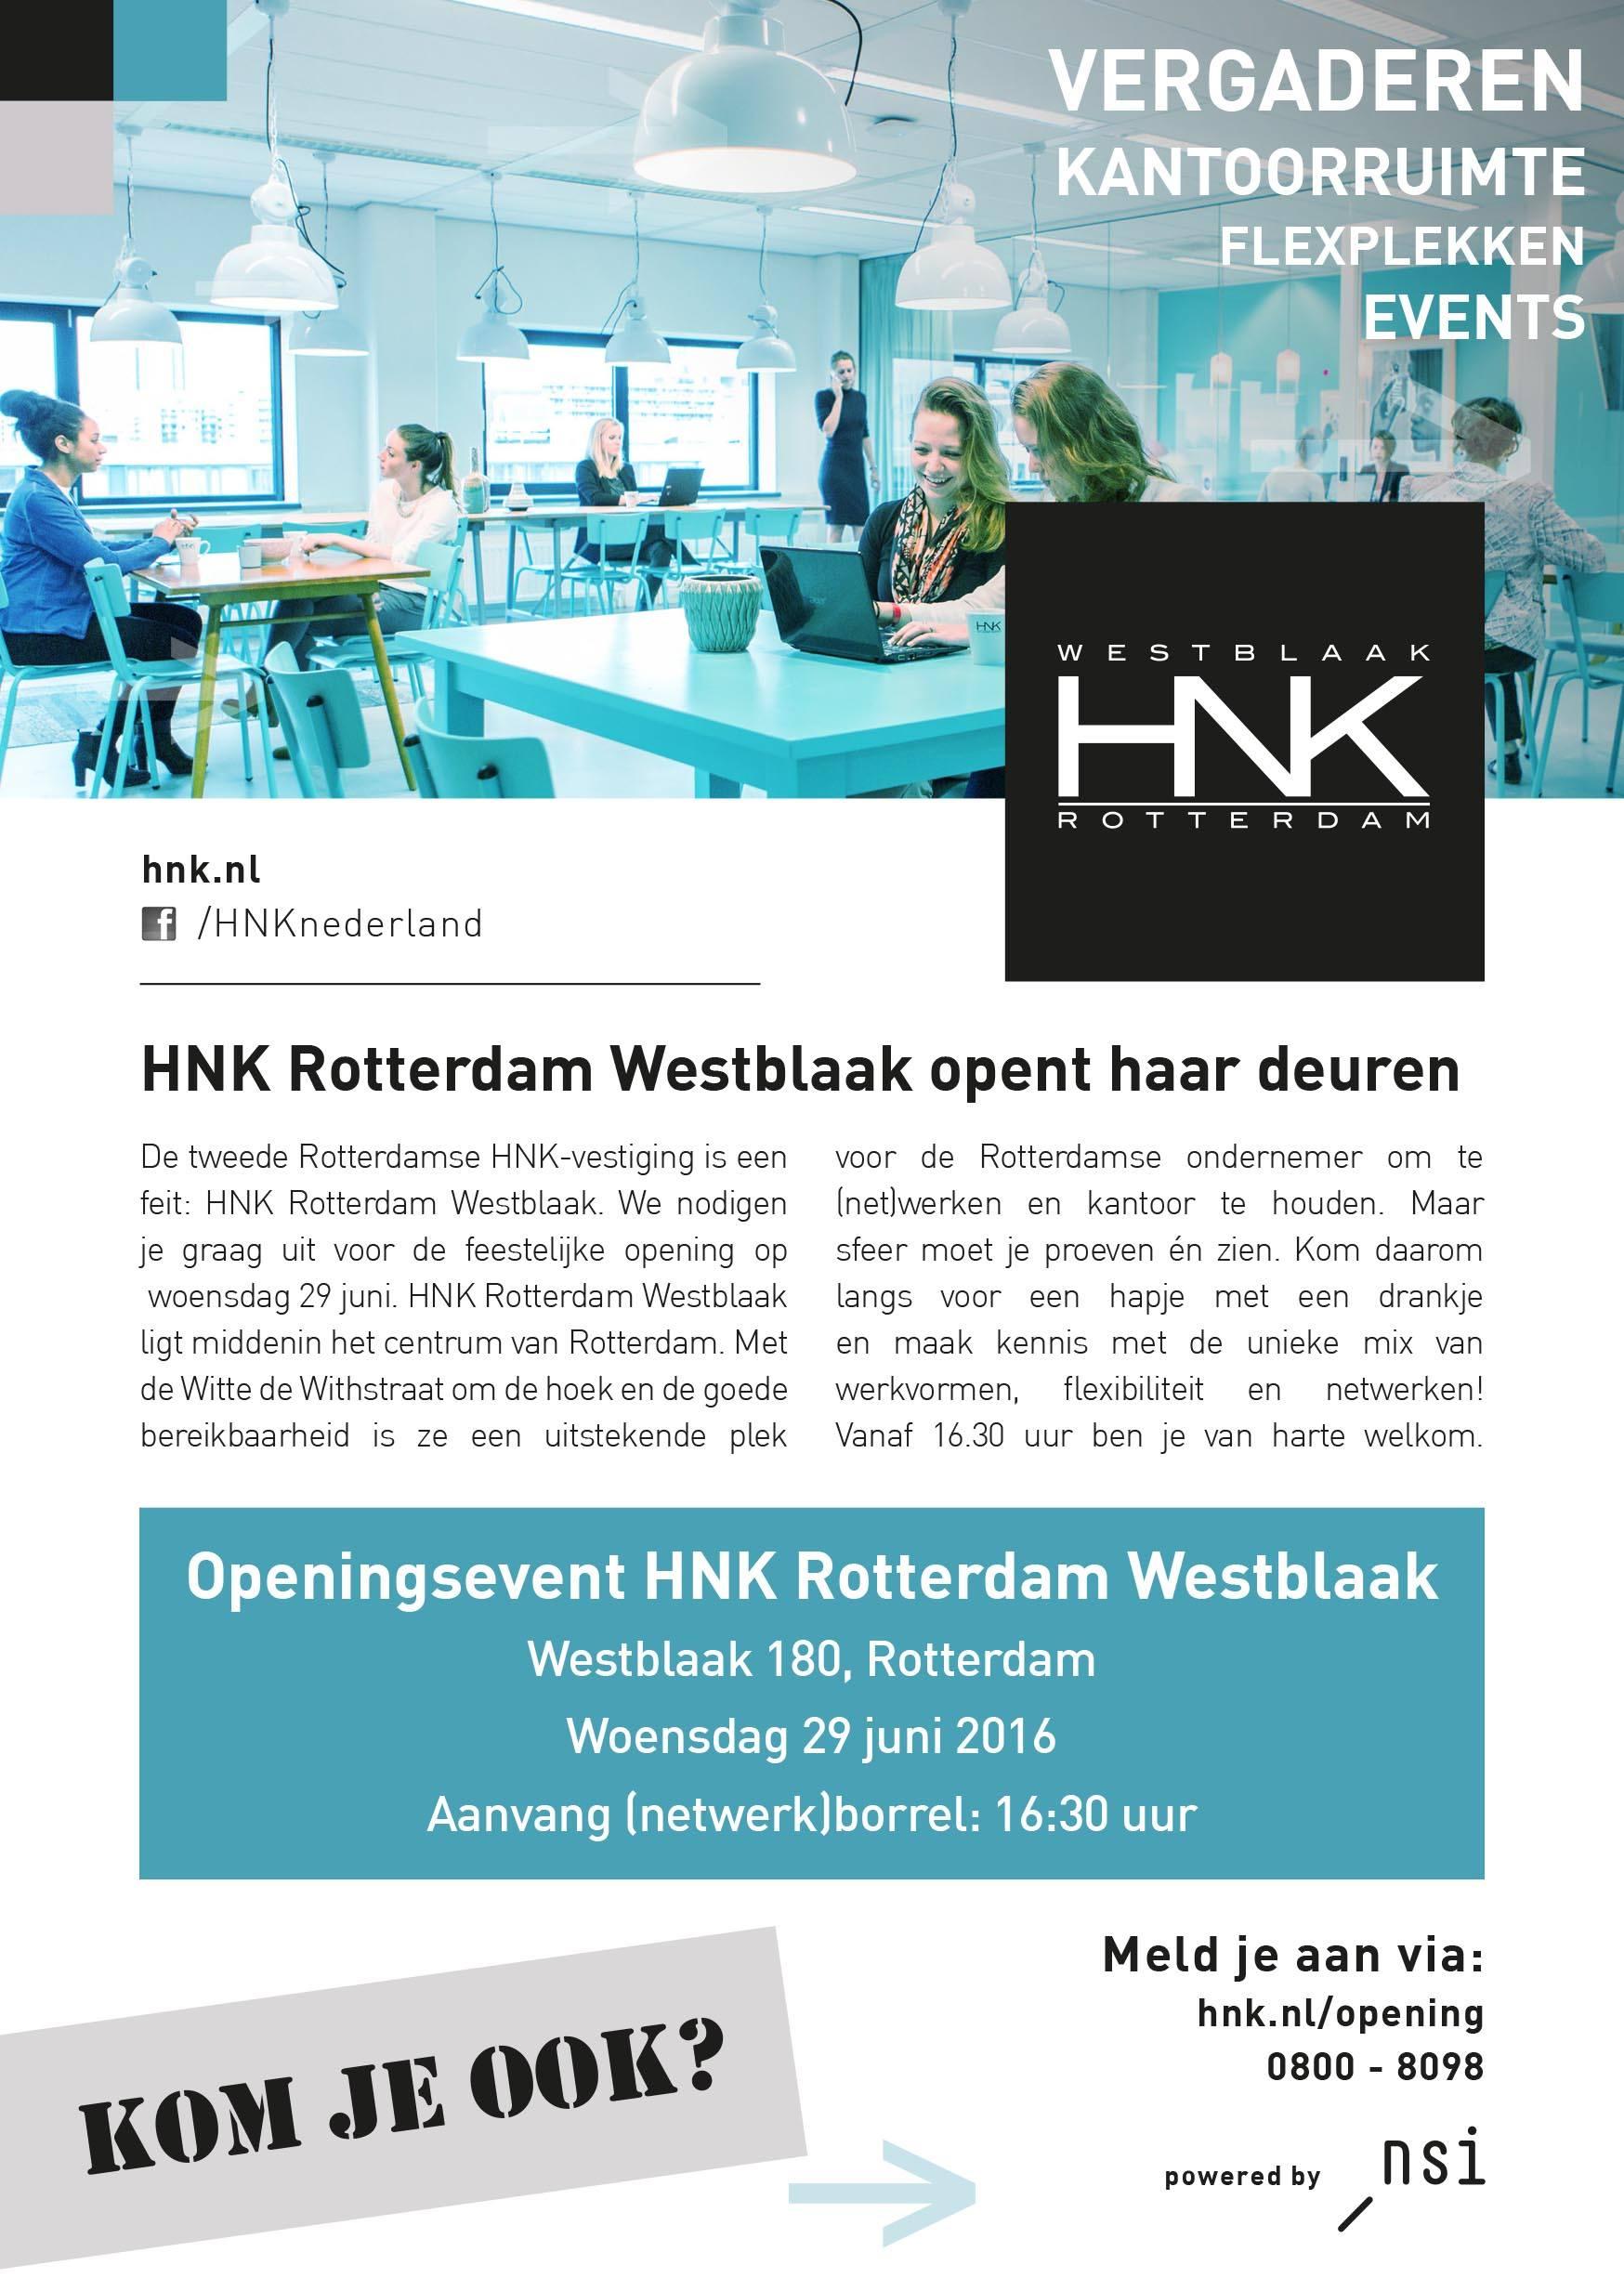 Flyer opening HNK Rotterdam Westblaak